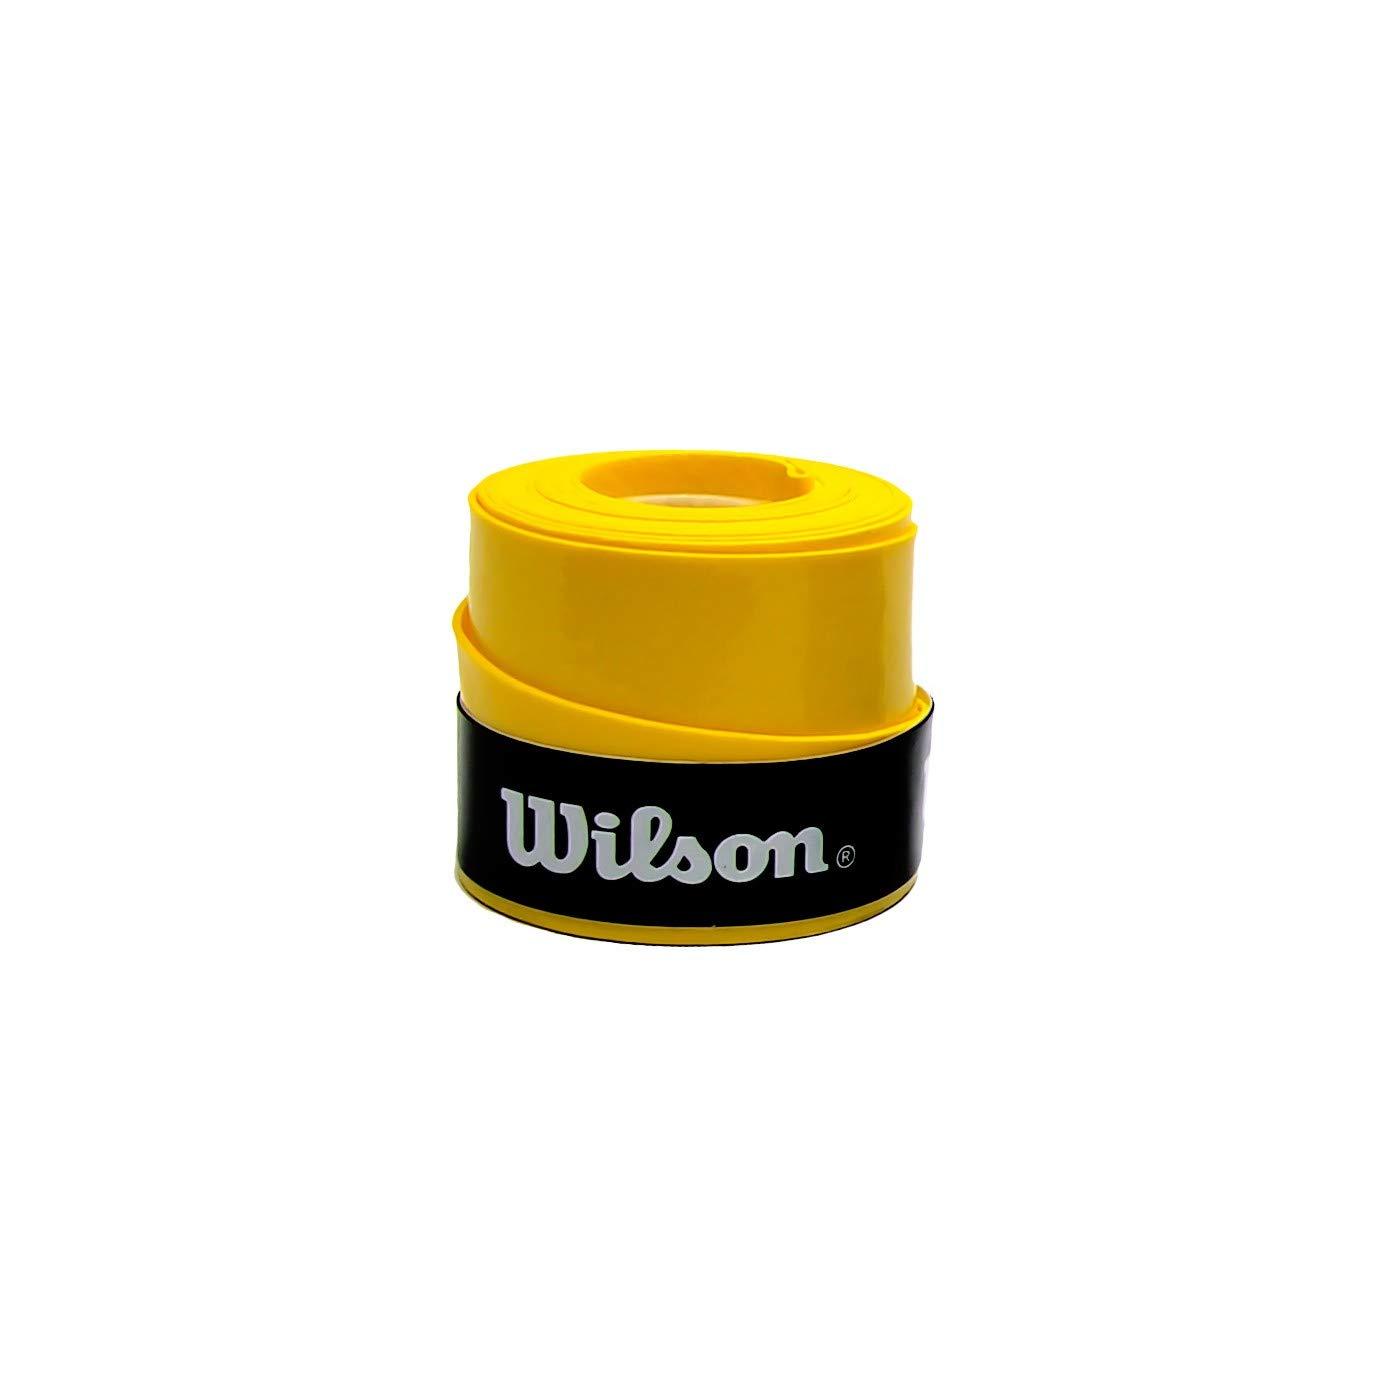 ZRZ Pack Grip Padel HESACORE Tour Grip + 1und overgrip Wilson Confort Amarillo: Amazon.es: Deportes y aire libre